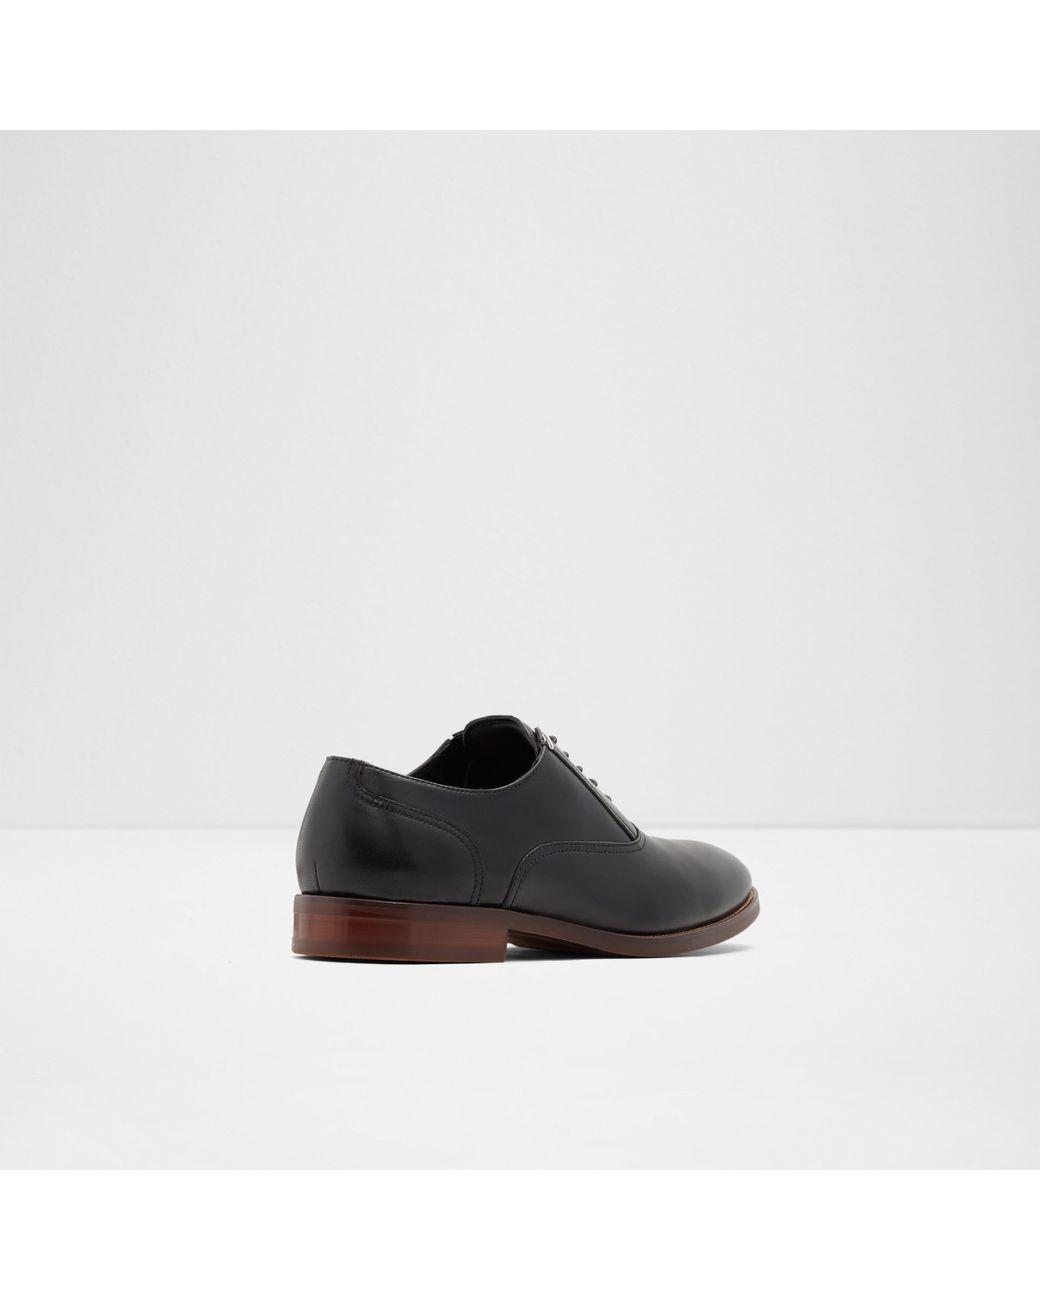 ALDO Leather Gerawen in Black for Men